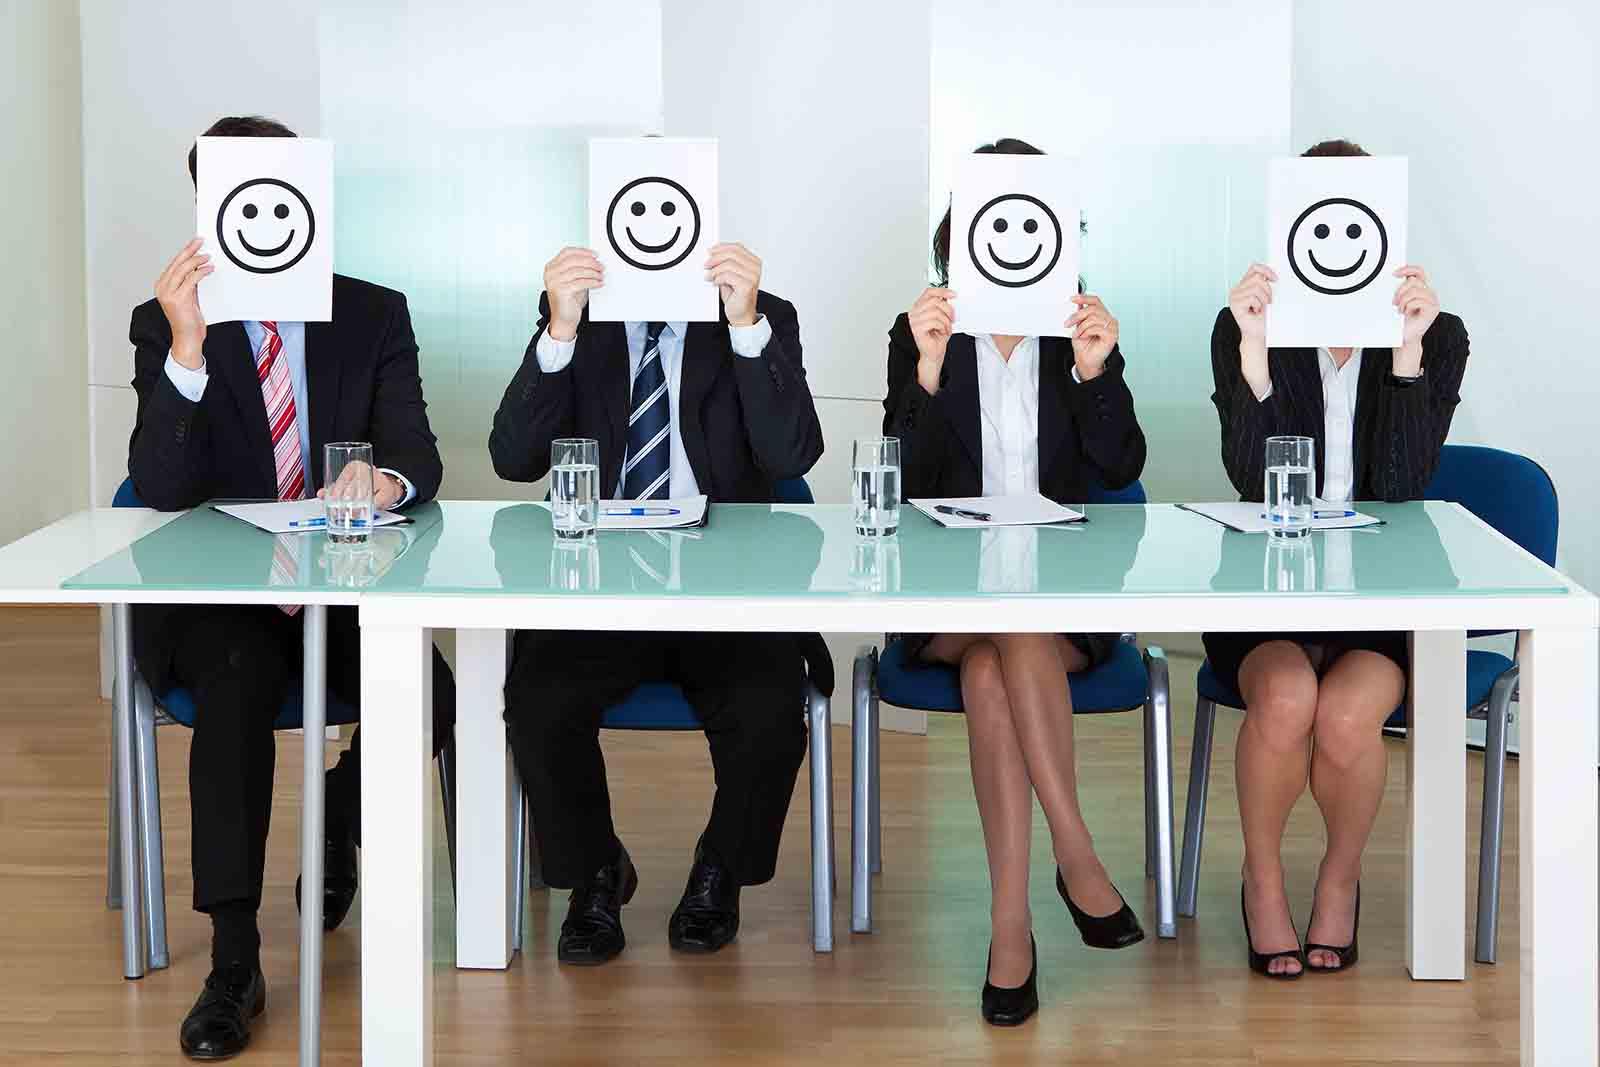 Héctor Jimenez - Marca Personal - Eje Central De Una Estrategia De Employer Branding - 3